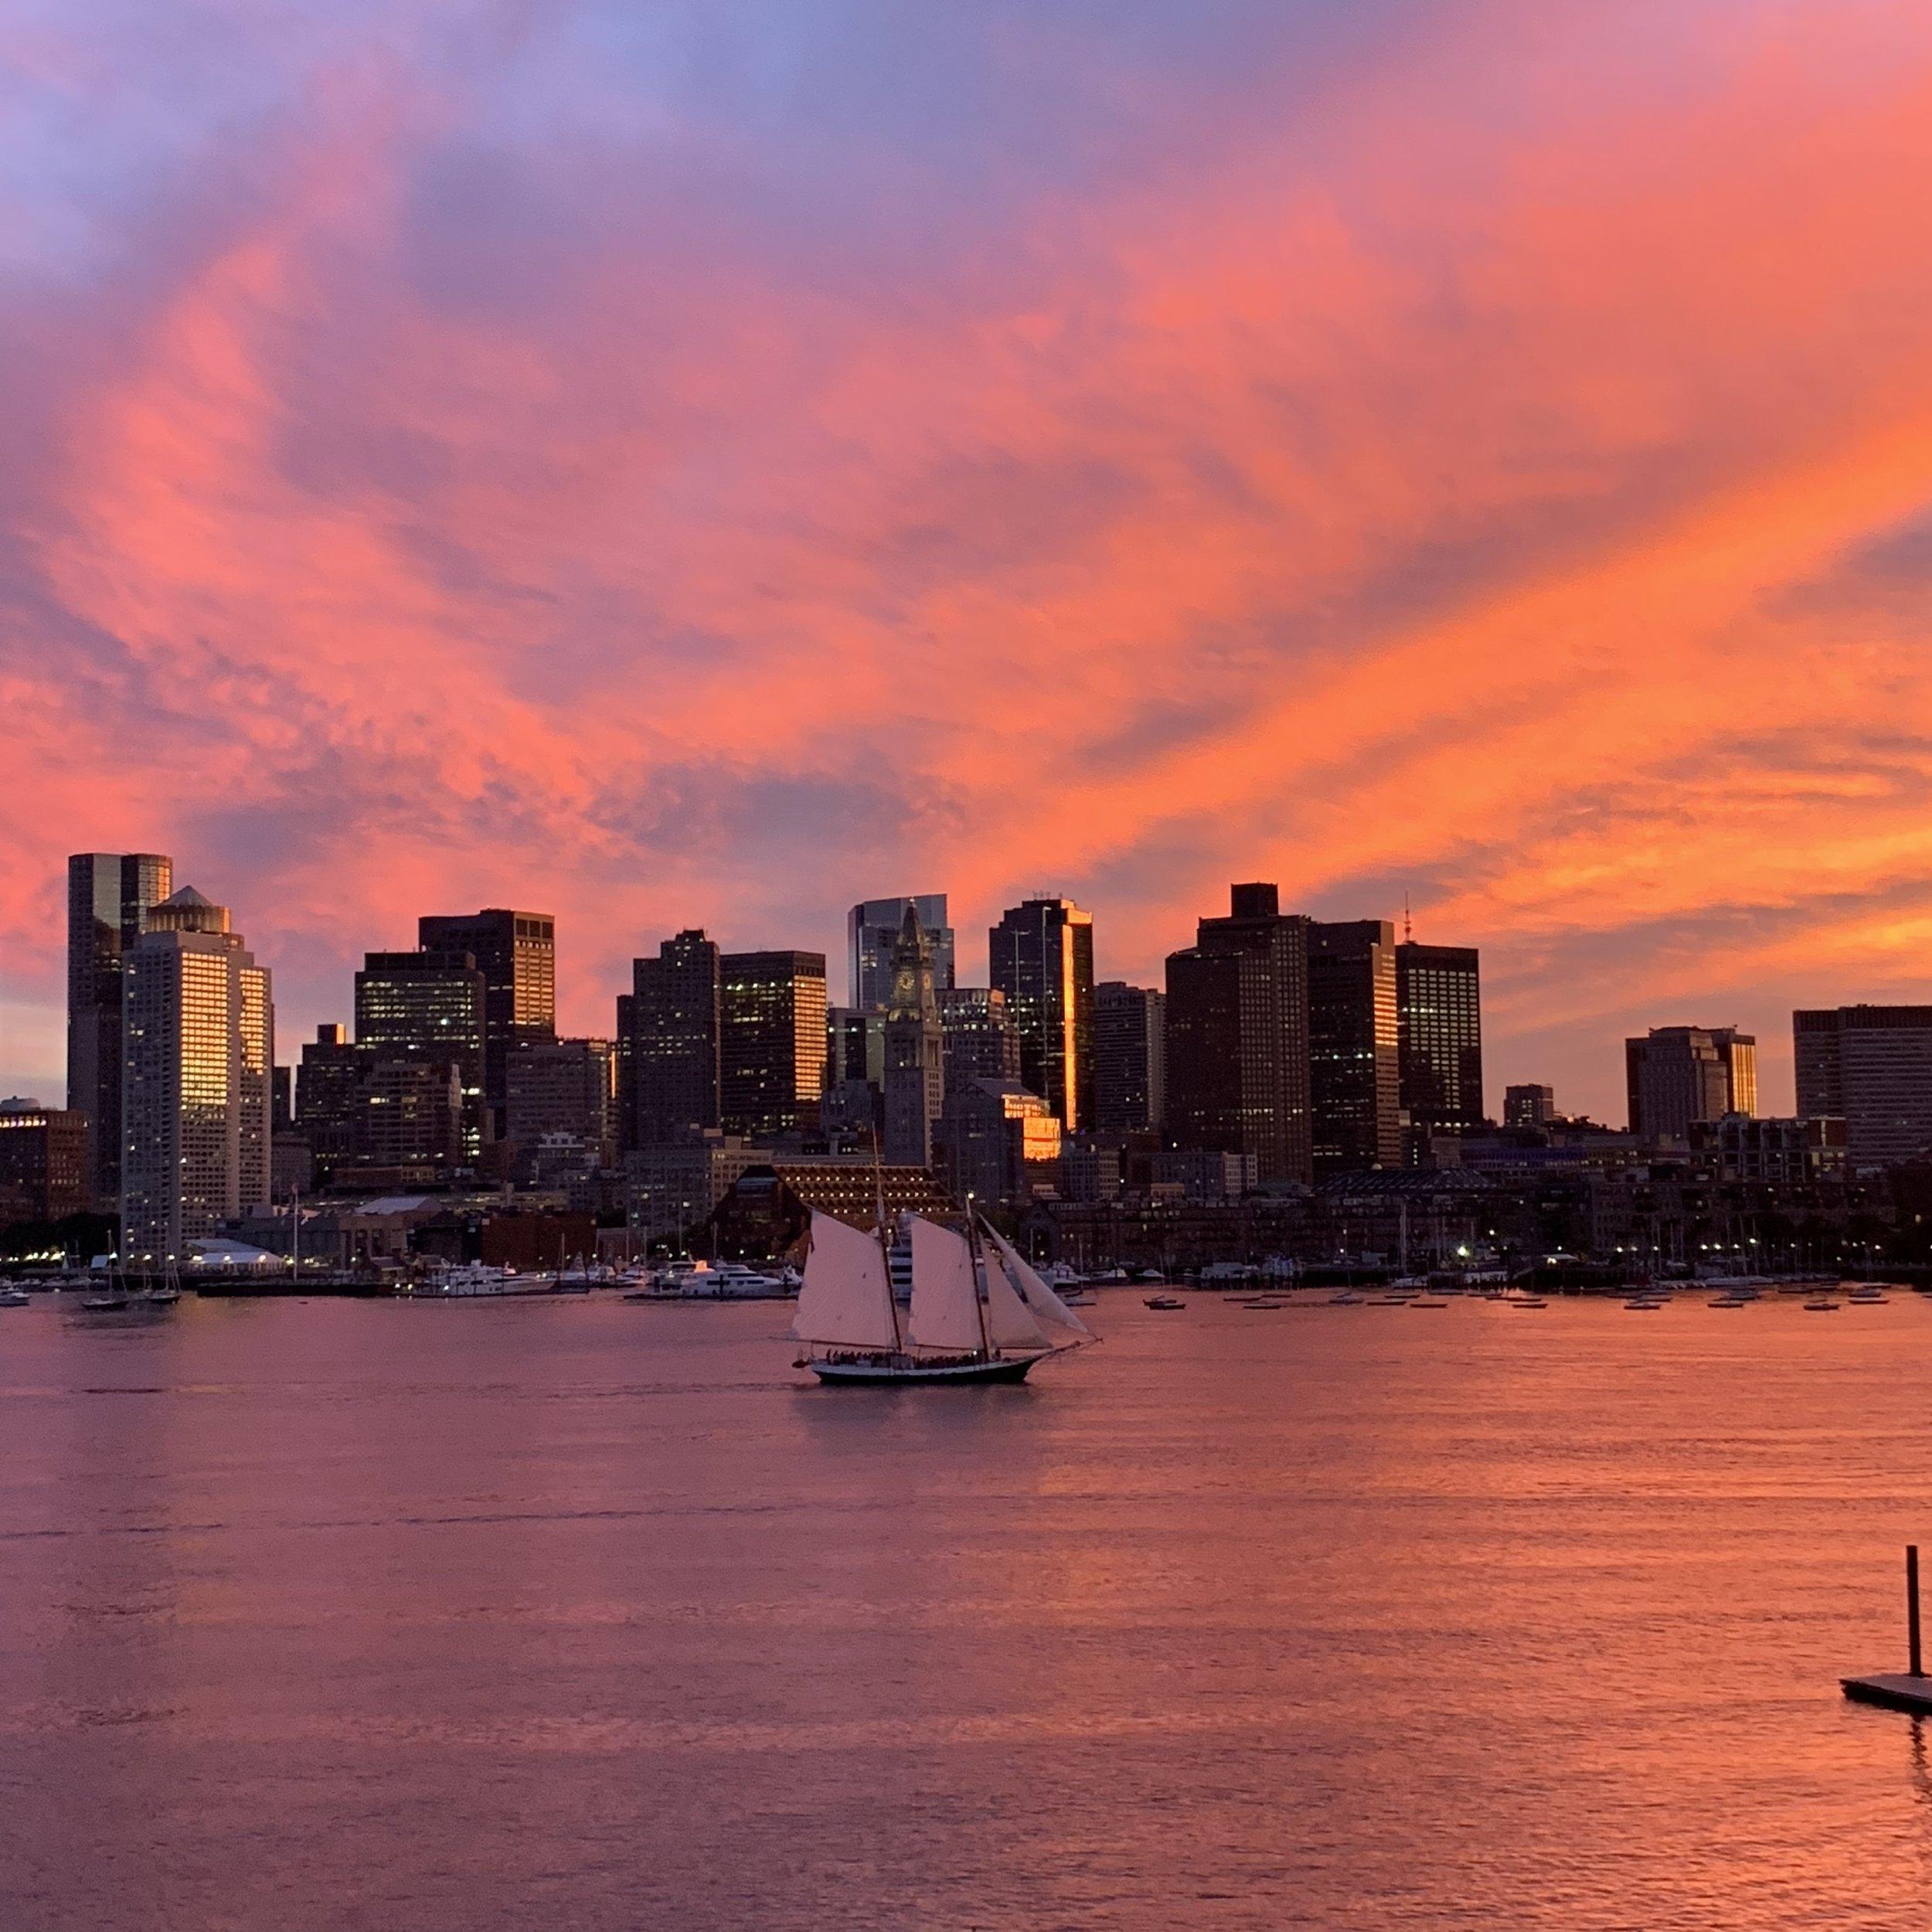 @frankmcadams - Boston, MA